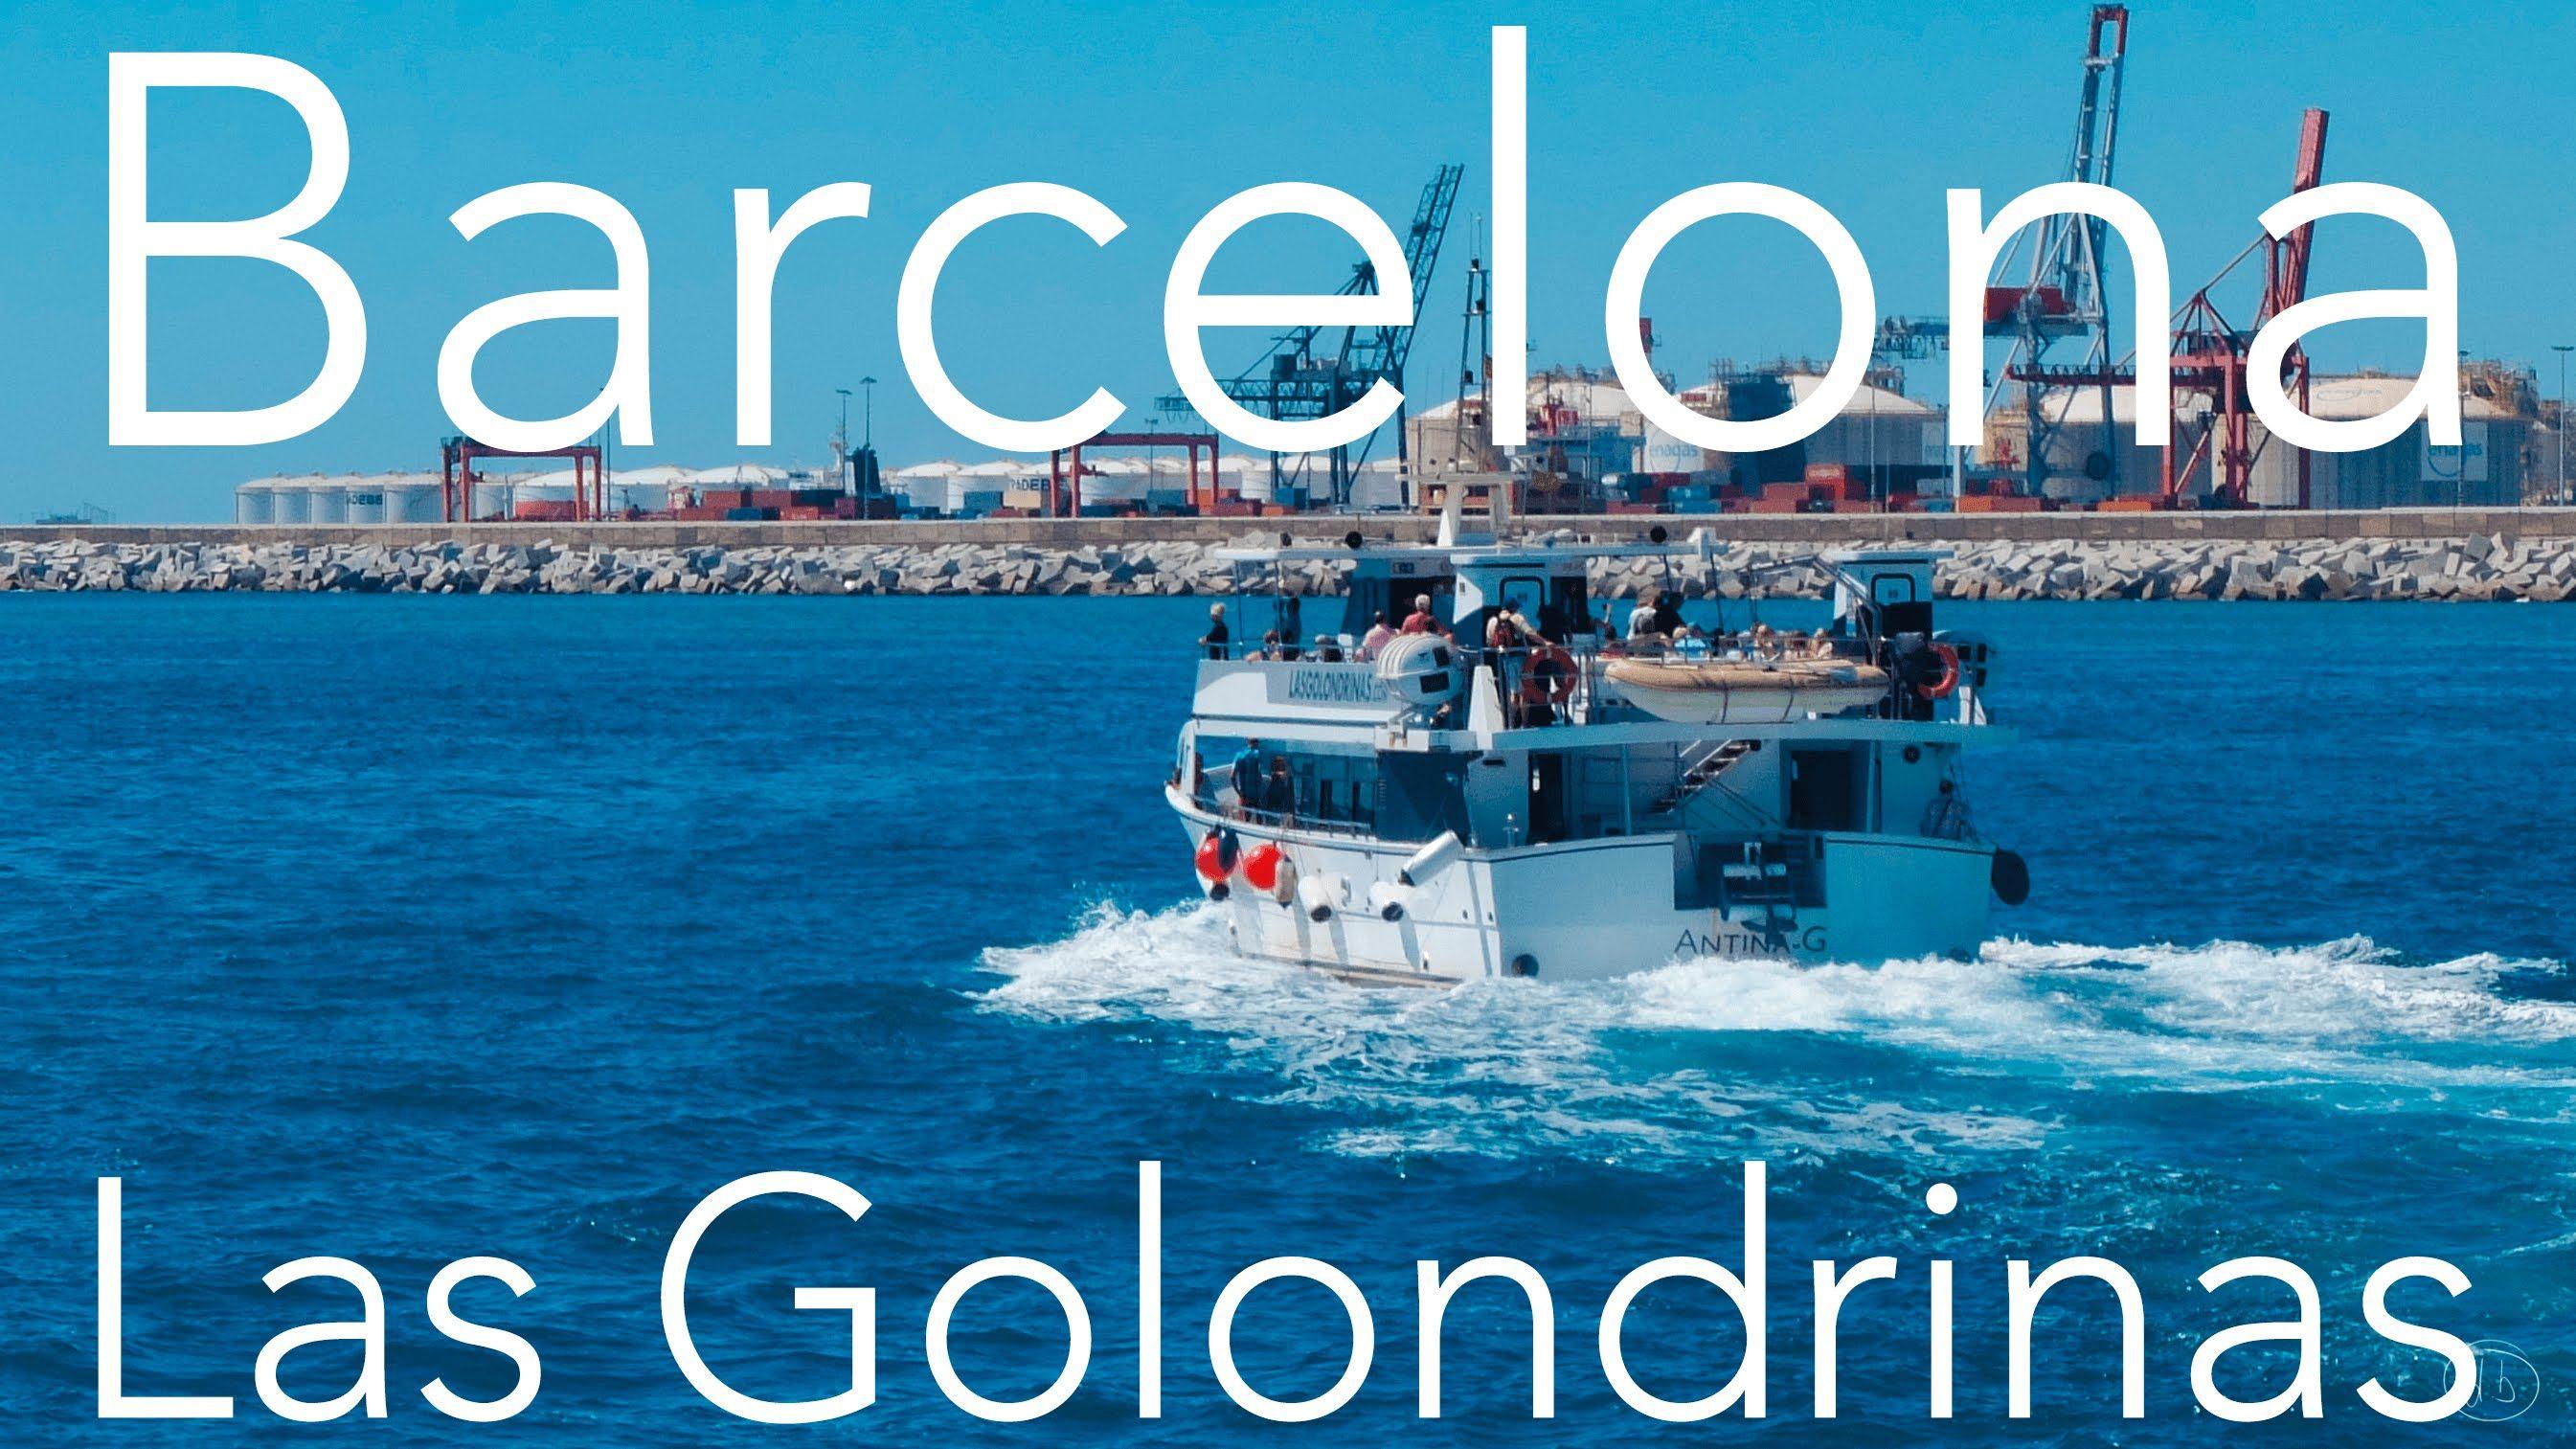 Barcelona - Las Golondrinas Skyline Tour (Stabilised GoPro Hero 4 Silver) Video…